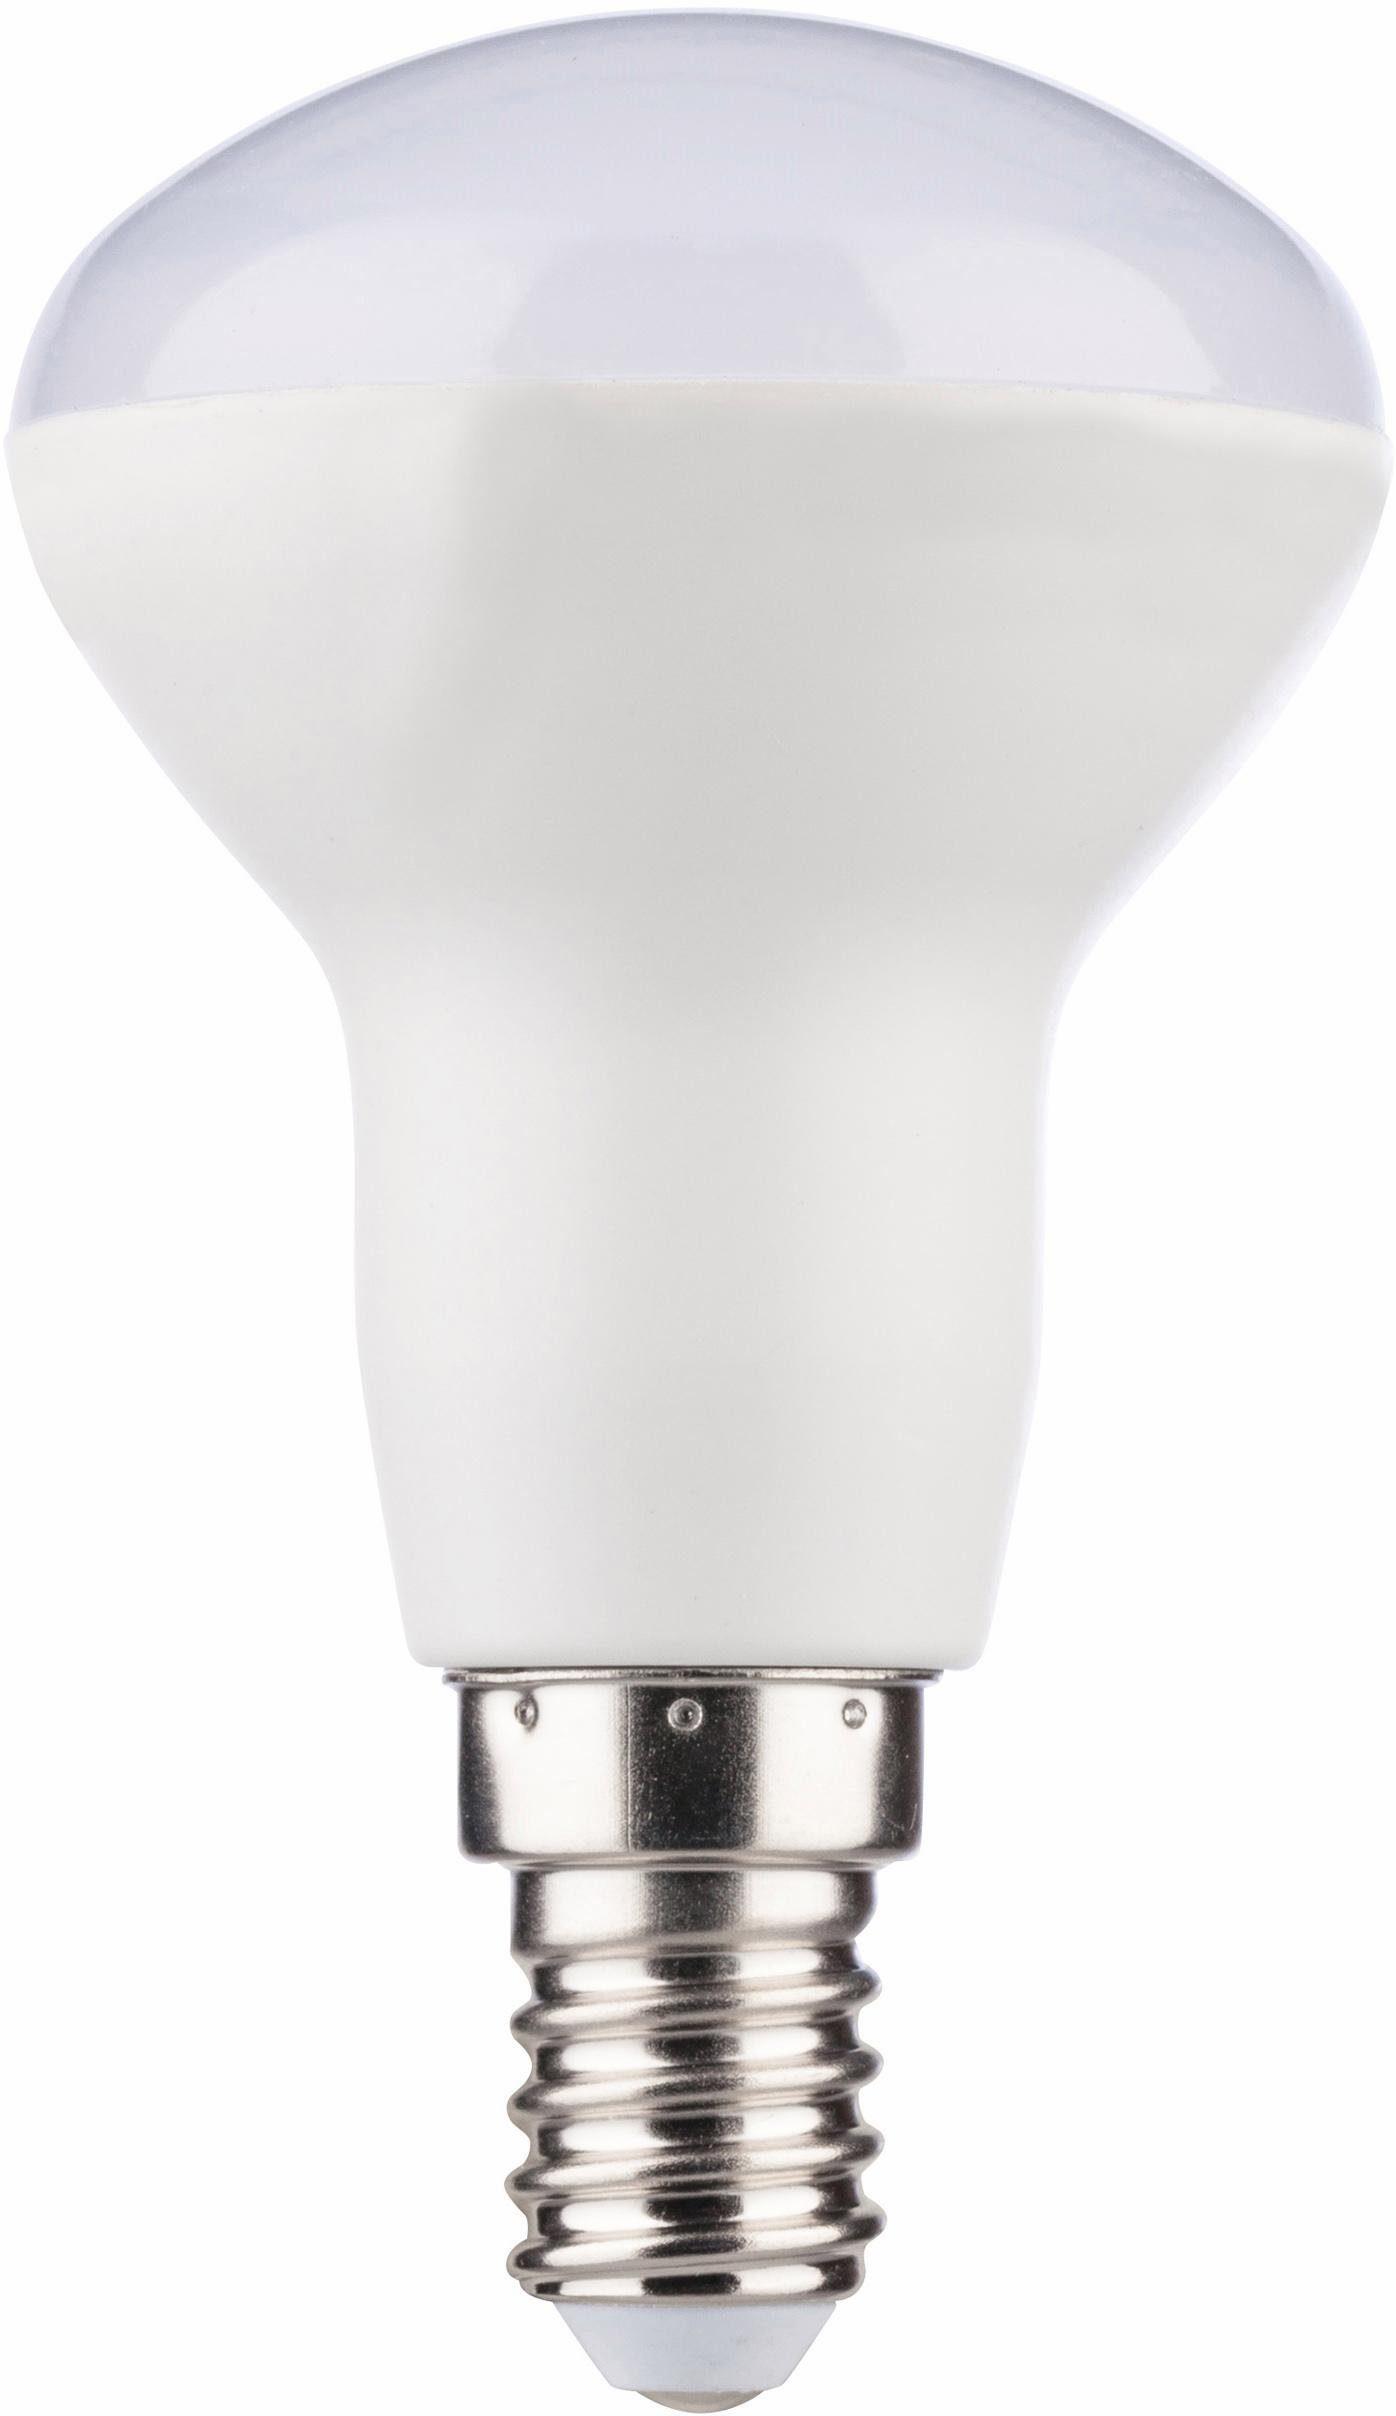 MÜLLER LICHT »Reflektor« LED-Leuchtmittel, E14, 6 Stück, Warmweiß